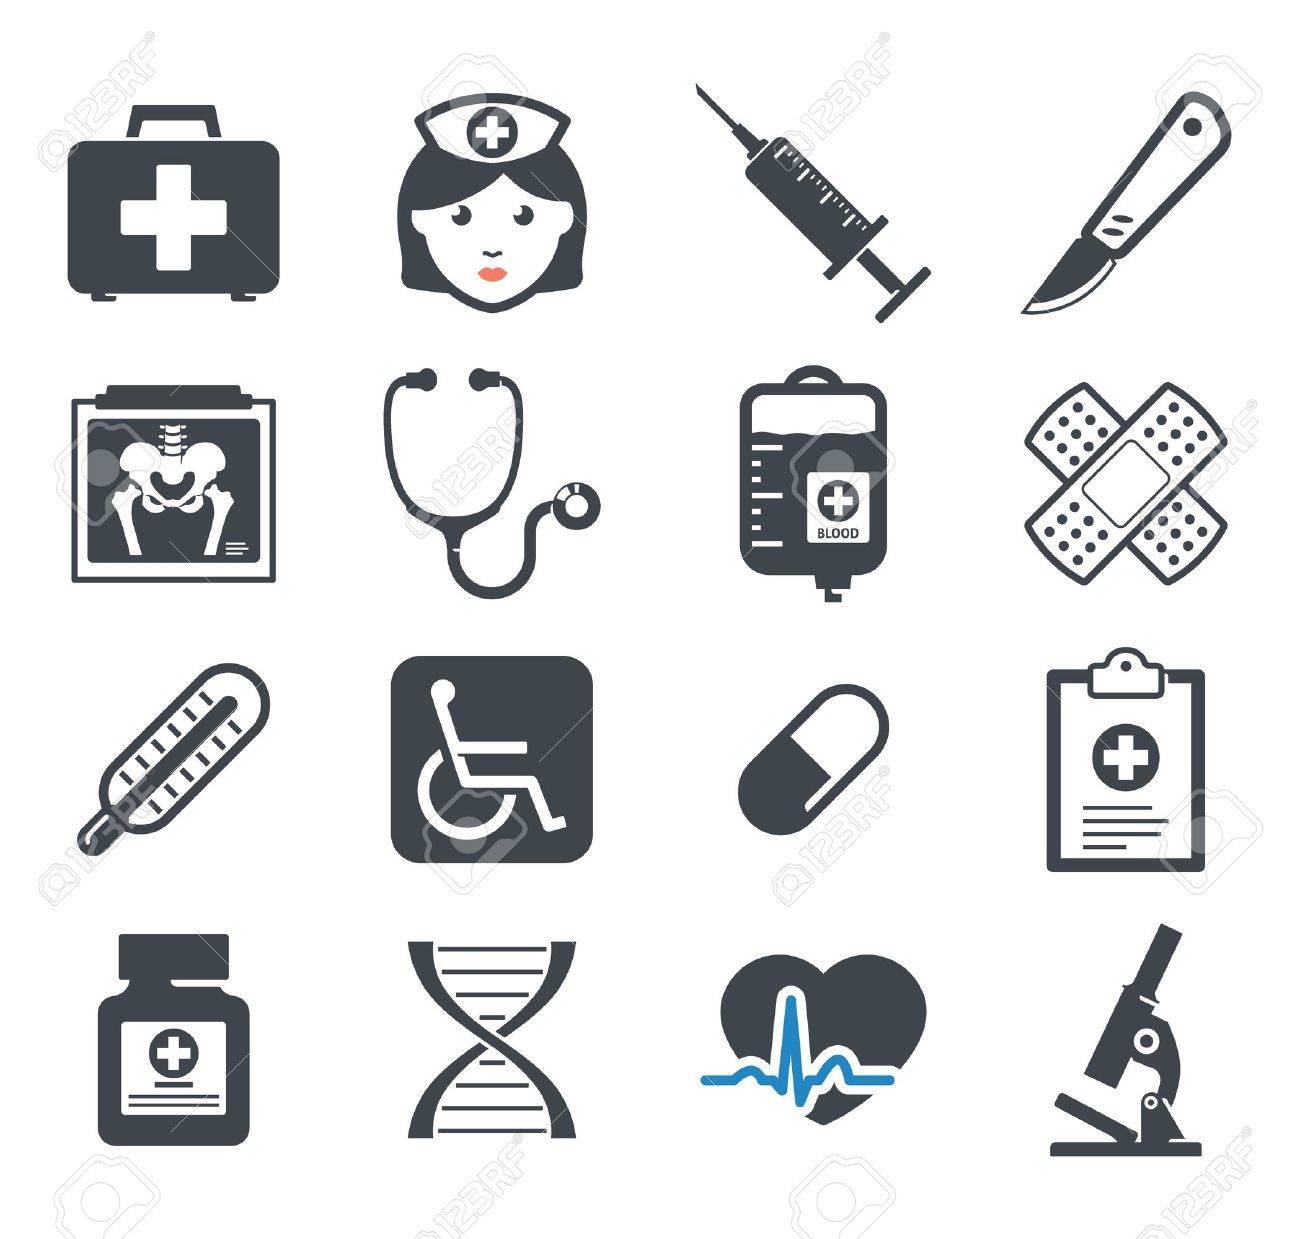 Medicine icons set - 20872515